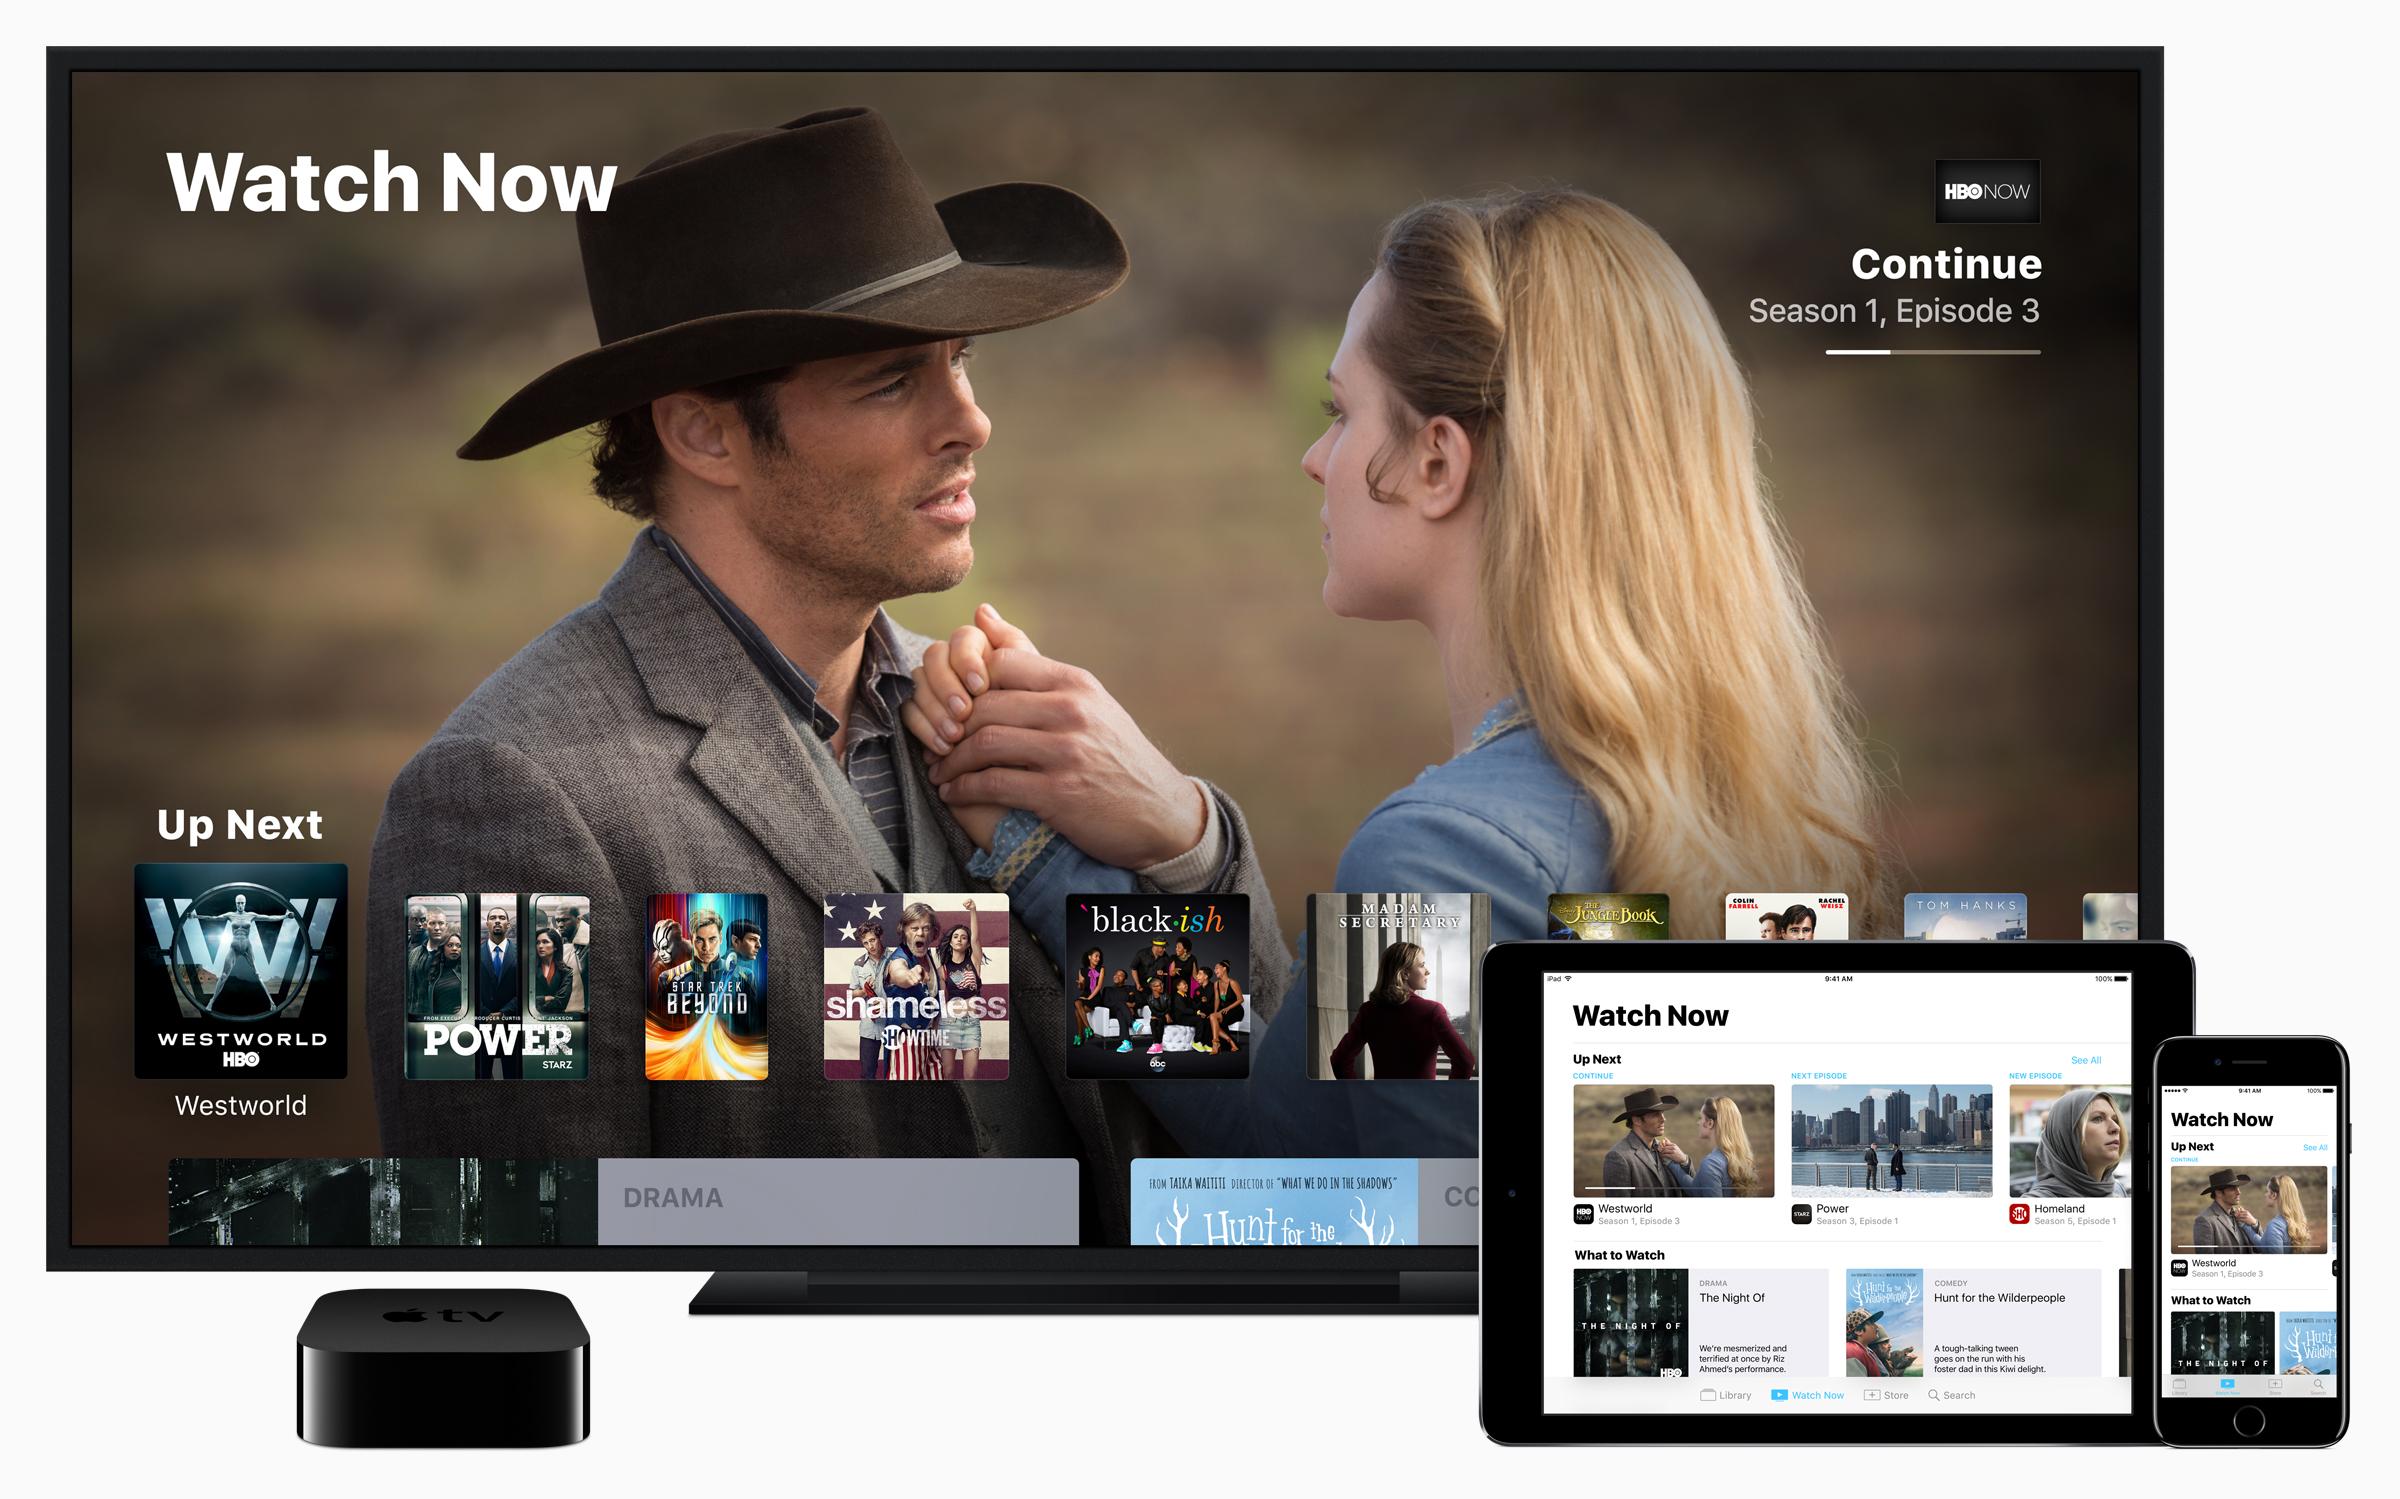 The Apple TV App on Apple TV, iPad, and iPhone.